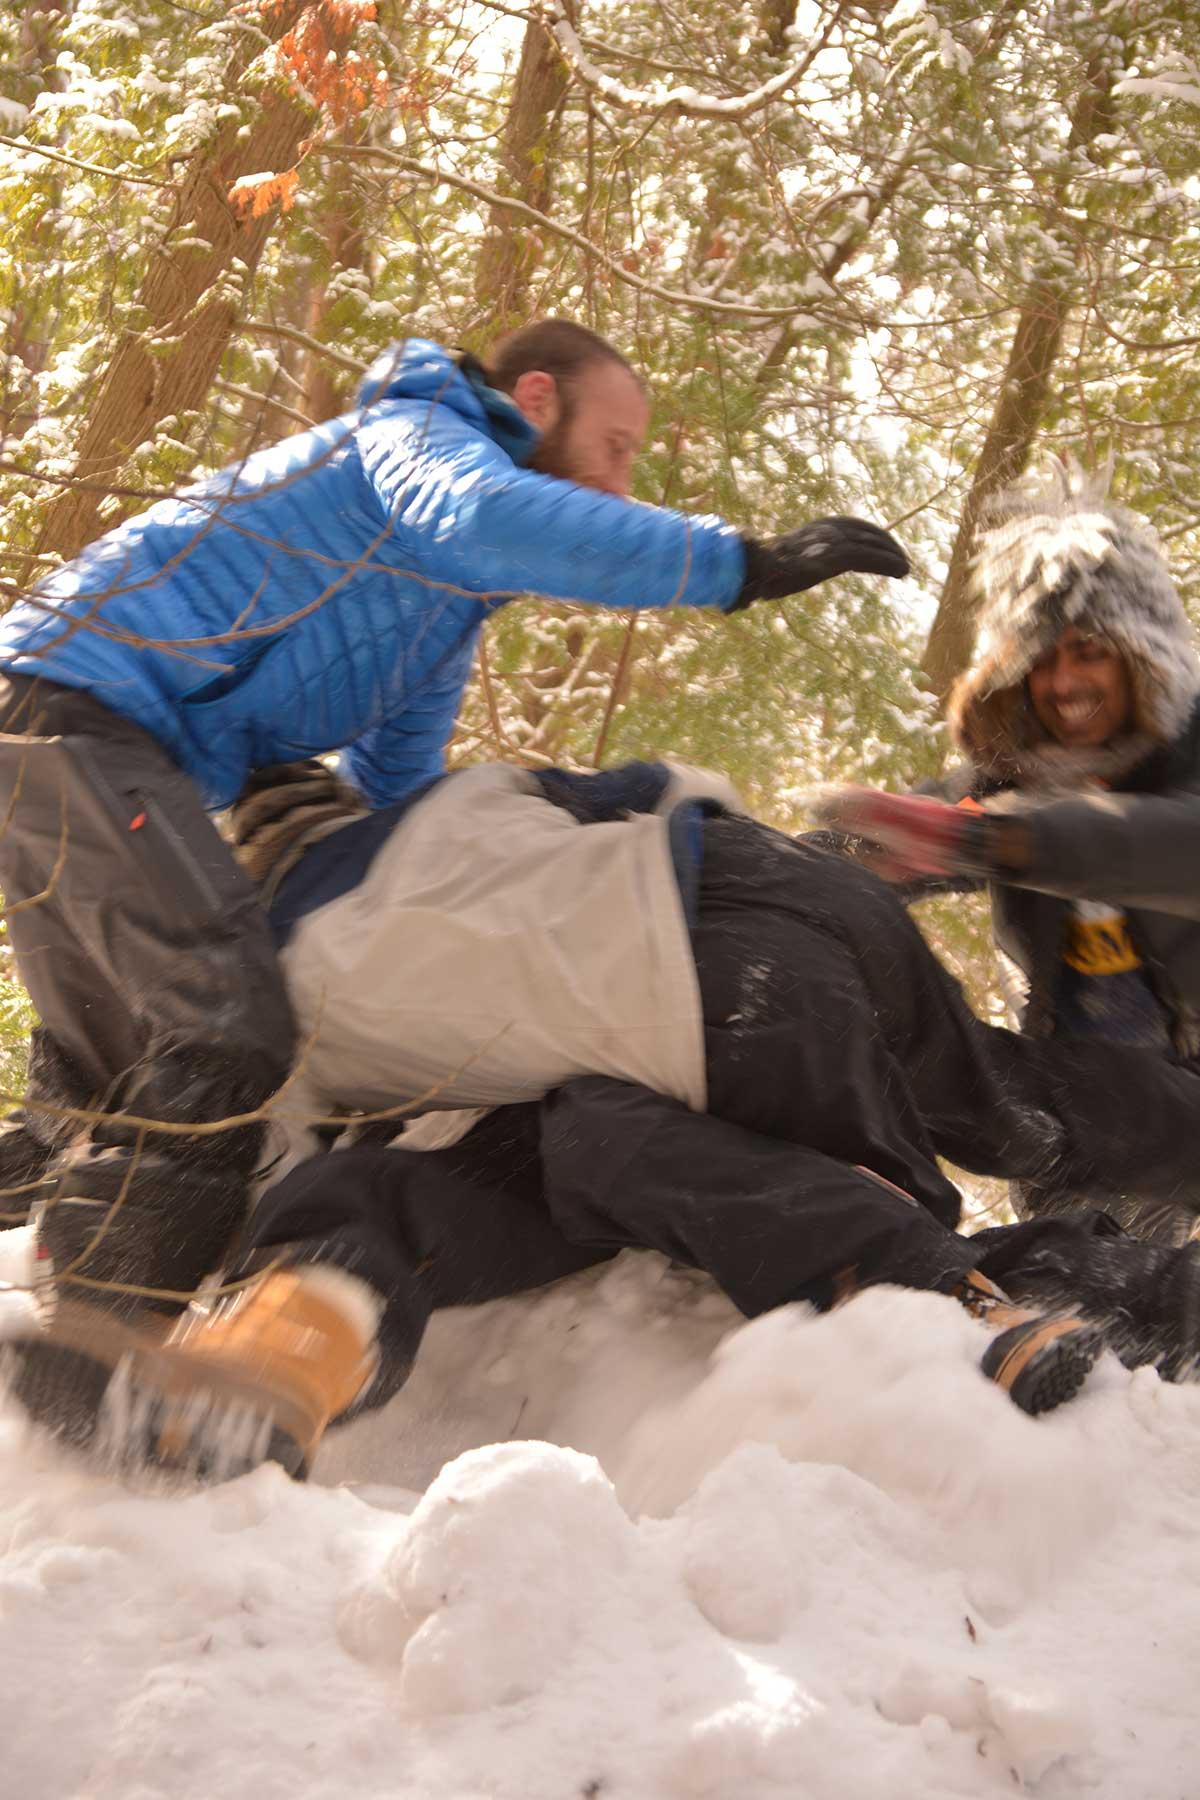 Winter-Camping-Feb-17-19,-2015-179.jpg